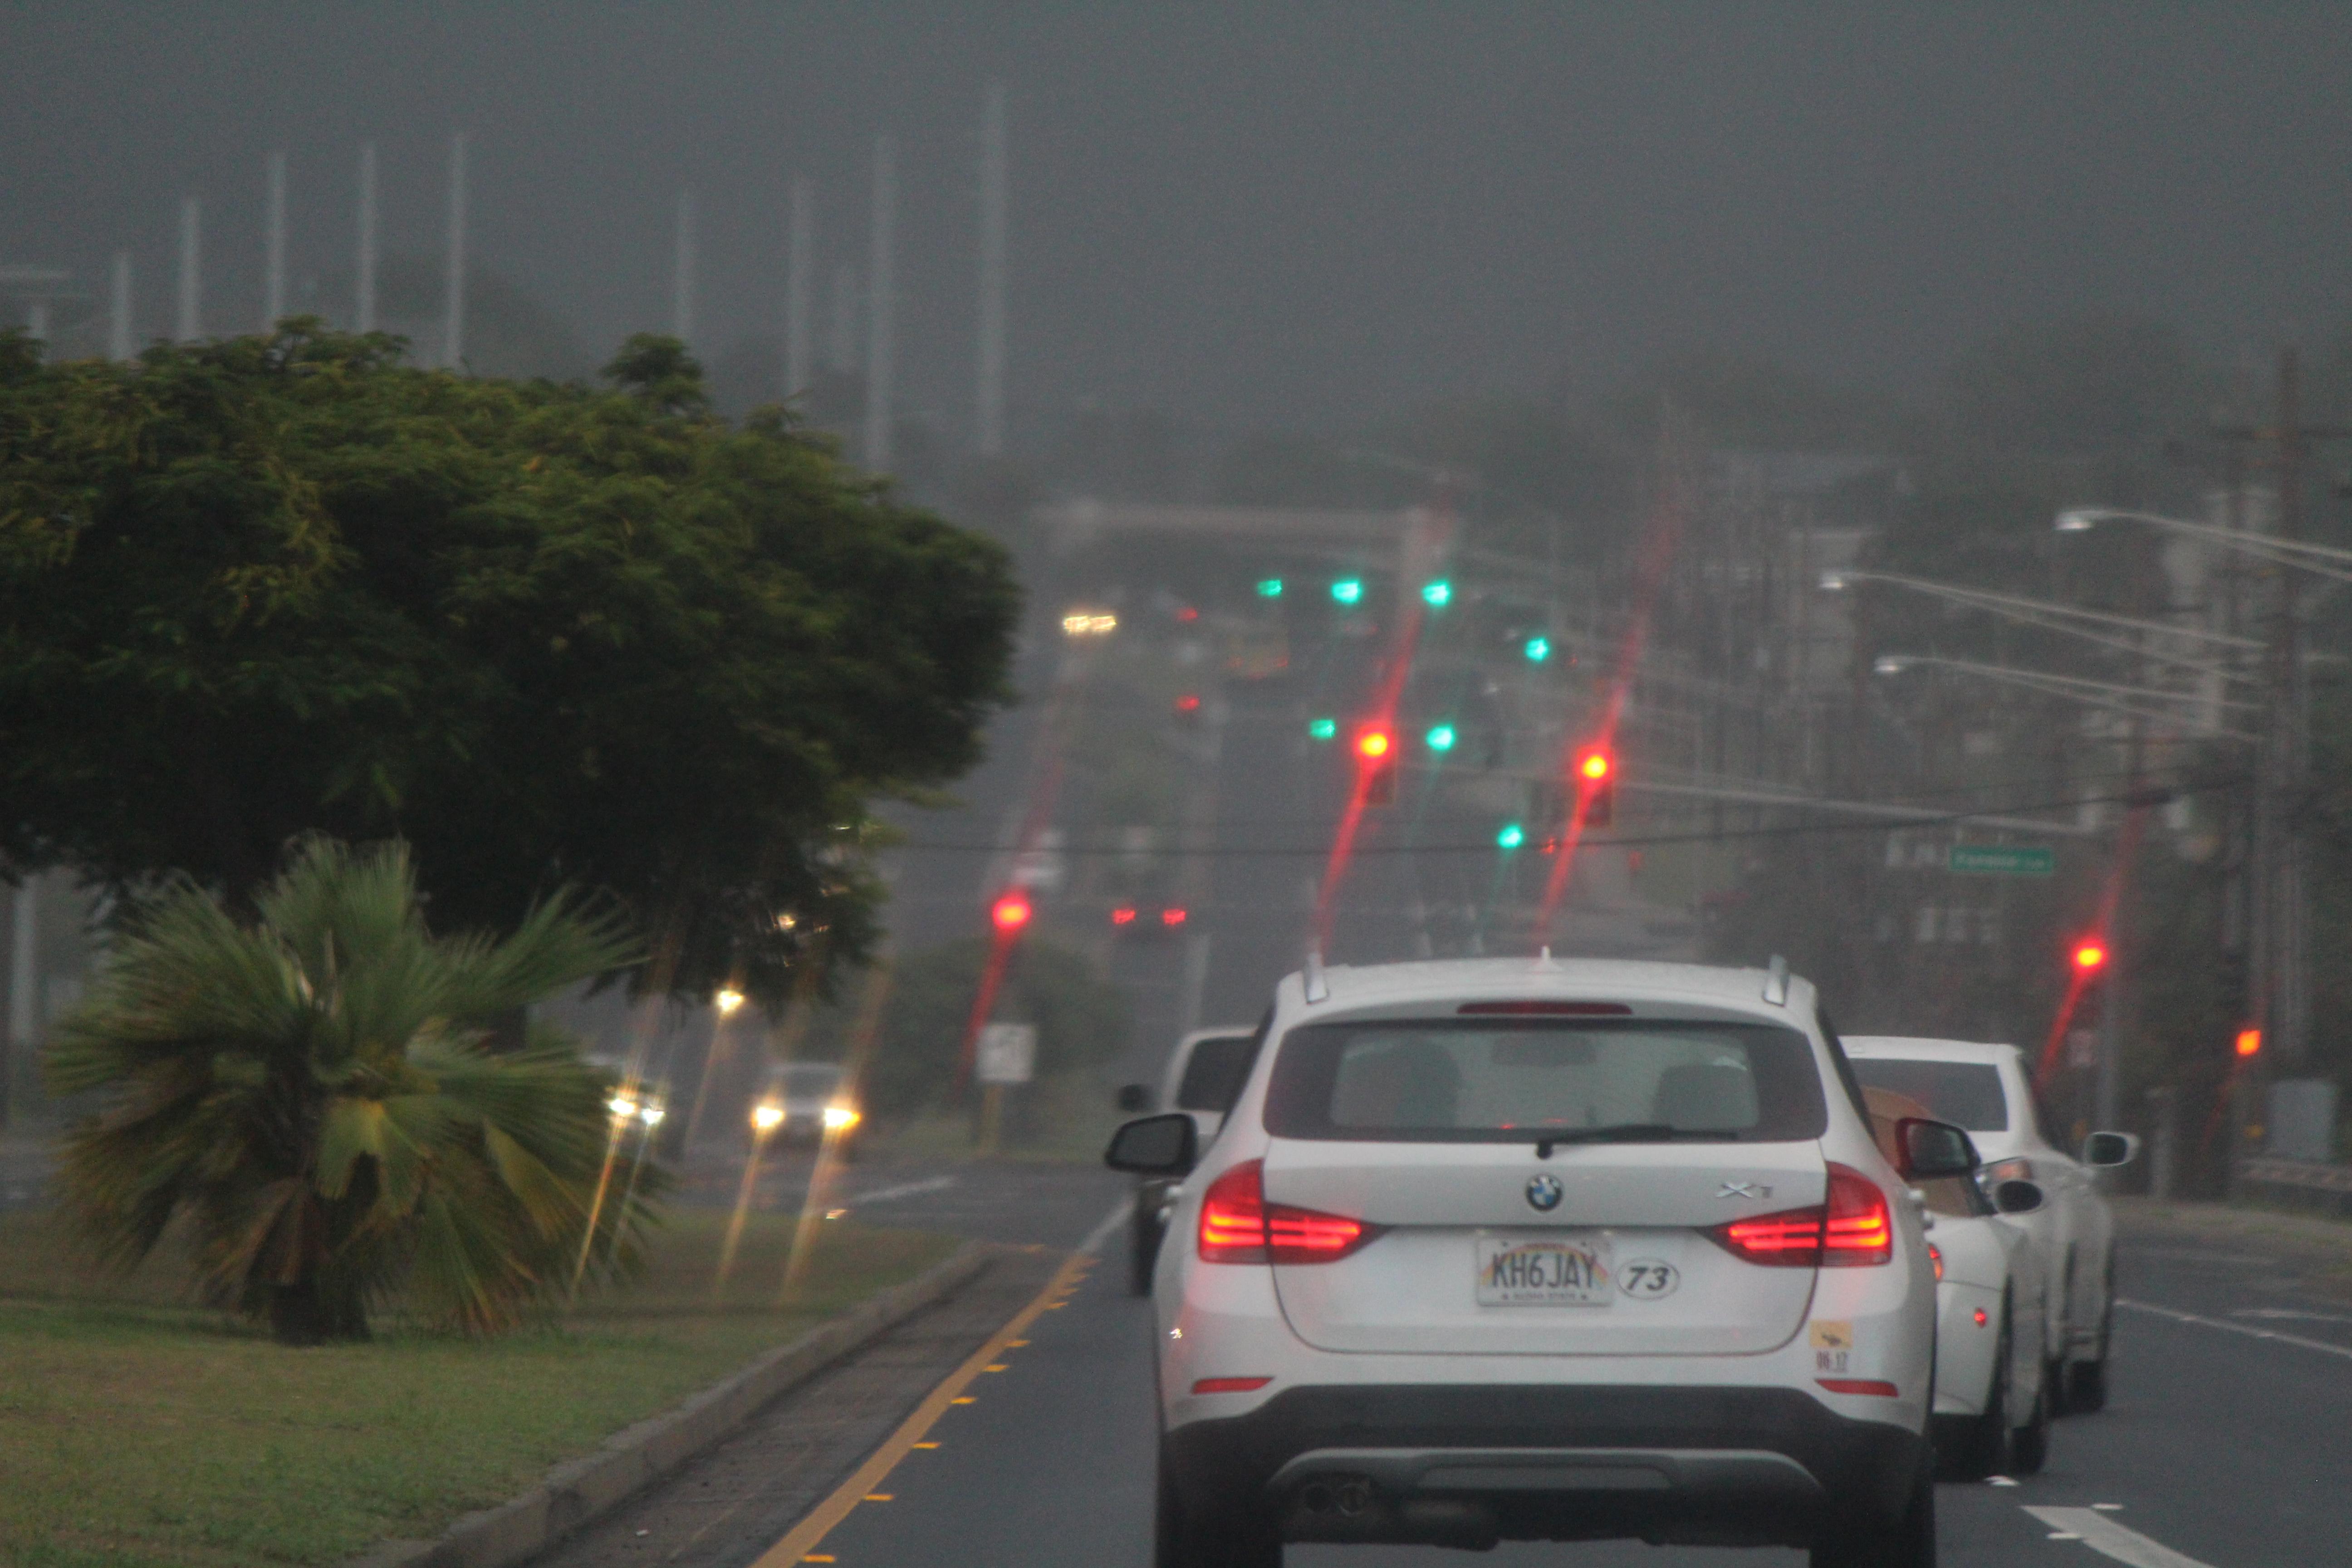 Hawai'i Gas Reminds Community to Prepare for Hurricane Season